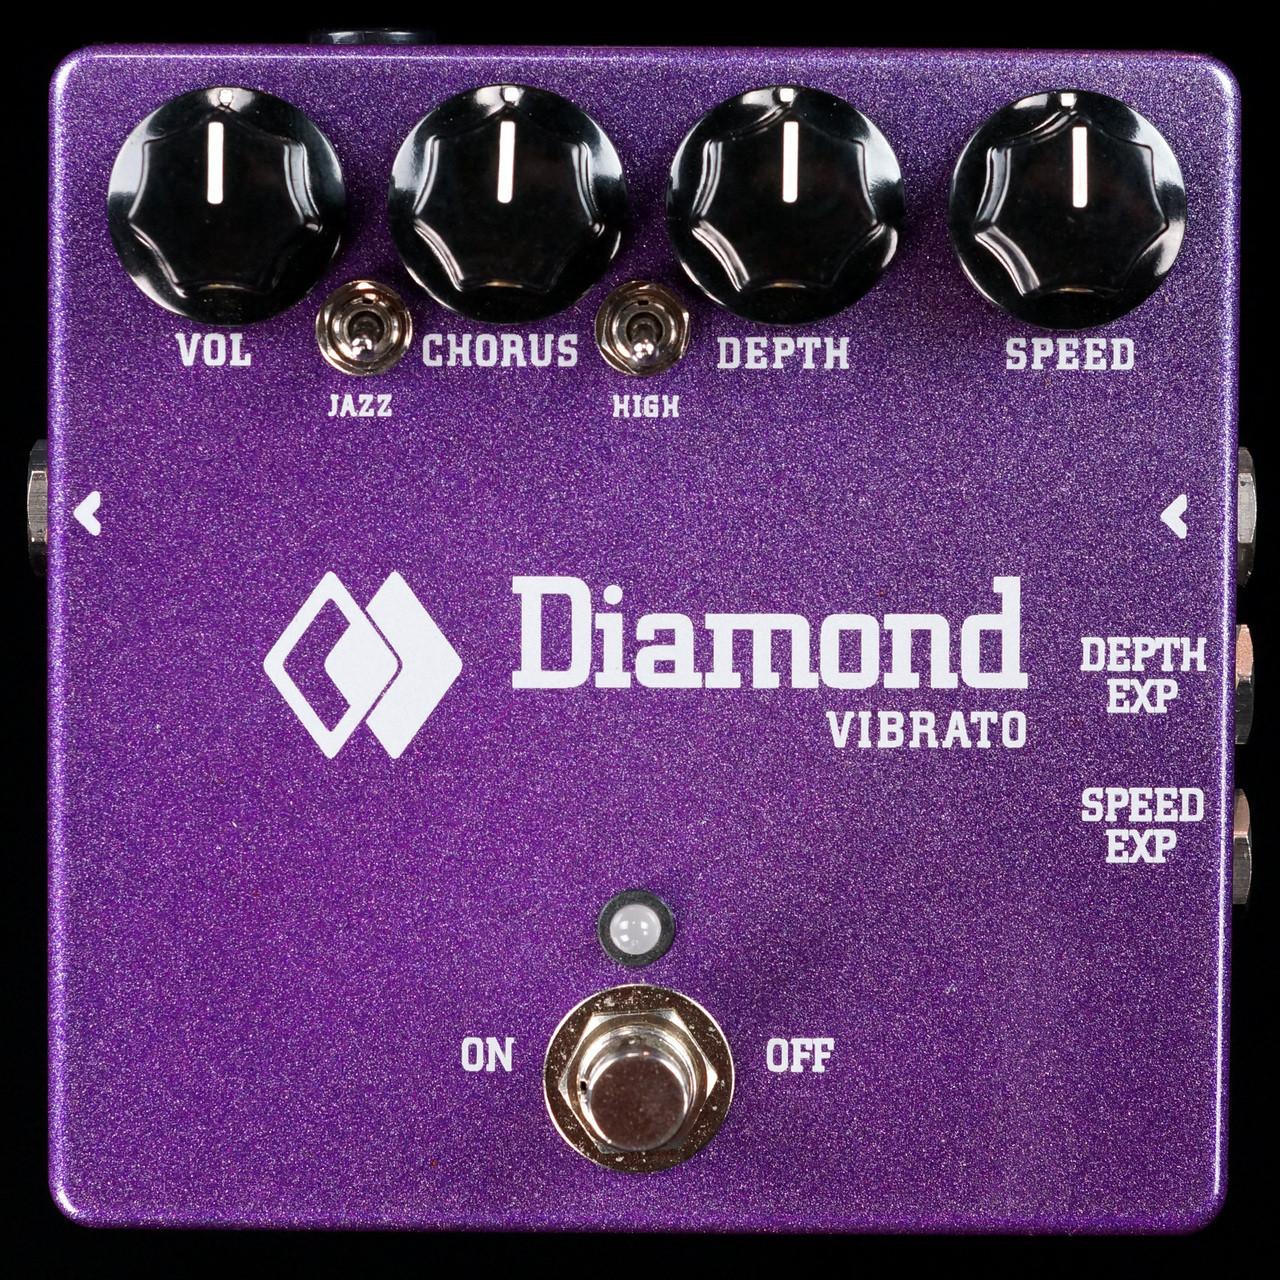 Diamond Analog Vibrato VIB1 1